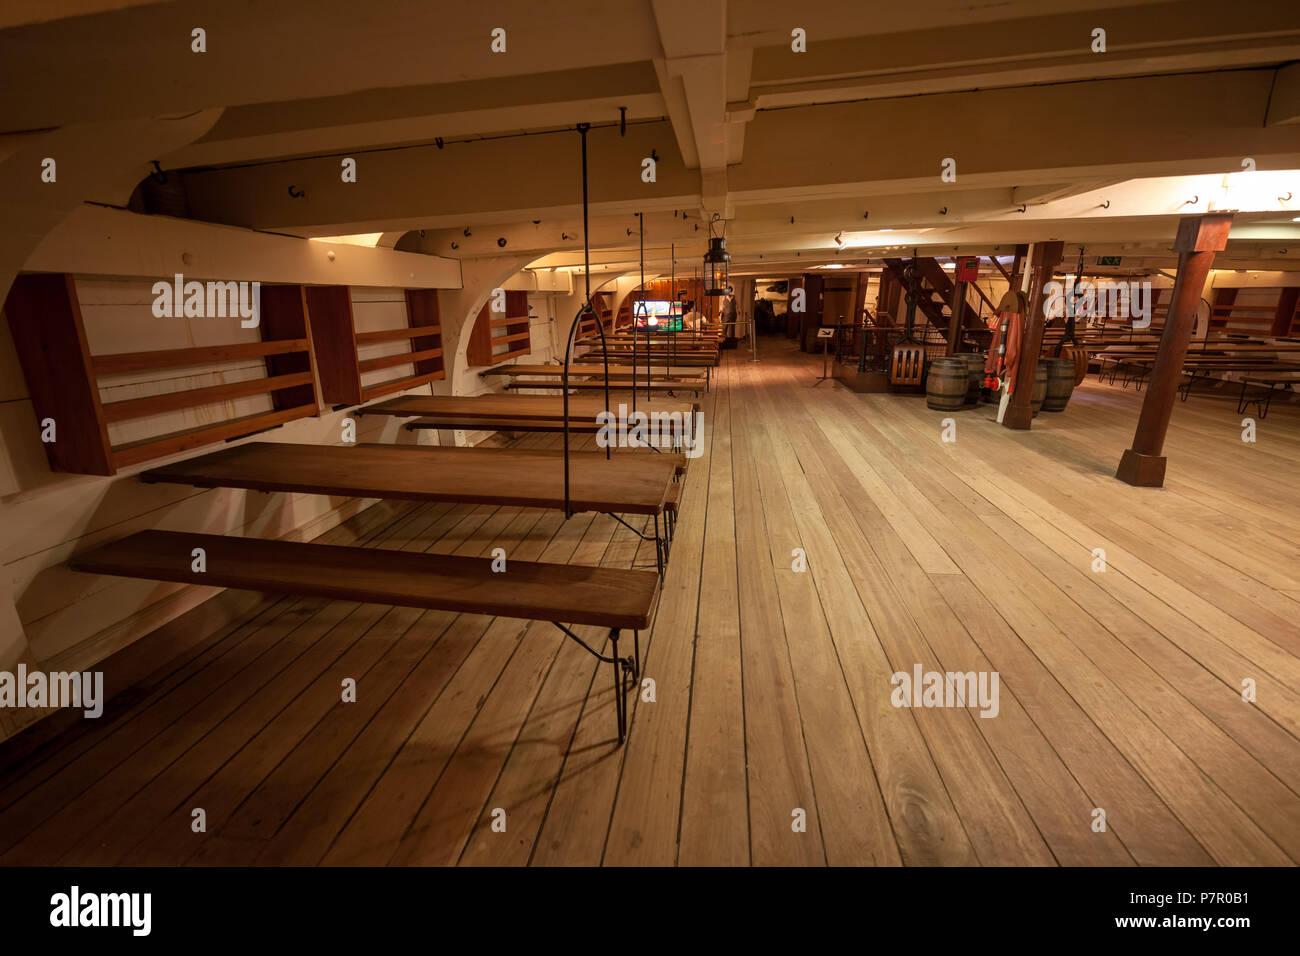 Fragata D. Fernando II e Gloria ship interior, tables in mess hall, frigate of the Portuguese Navy in Cacilhas, Almada, Portugal, 19th century sailing - Stock Image